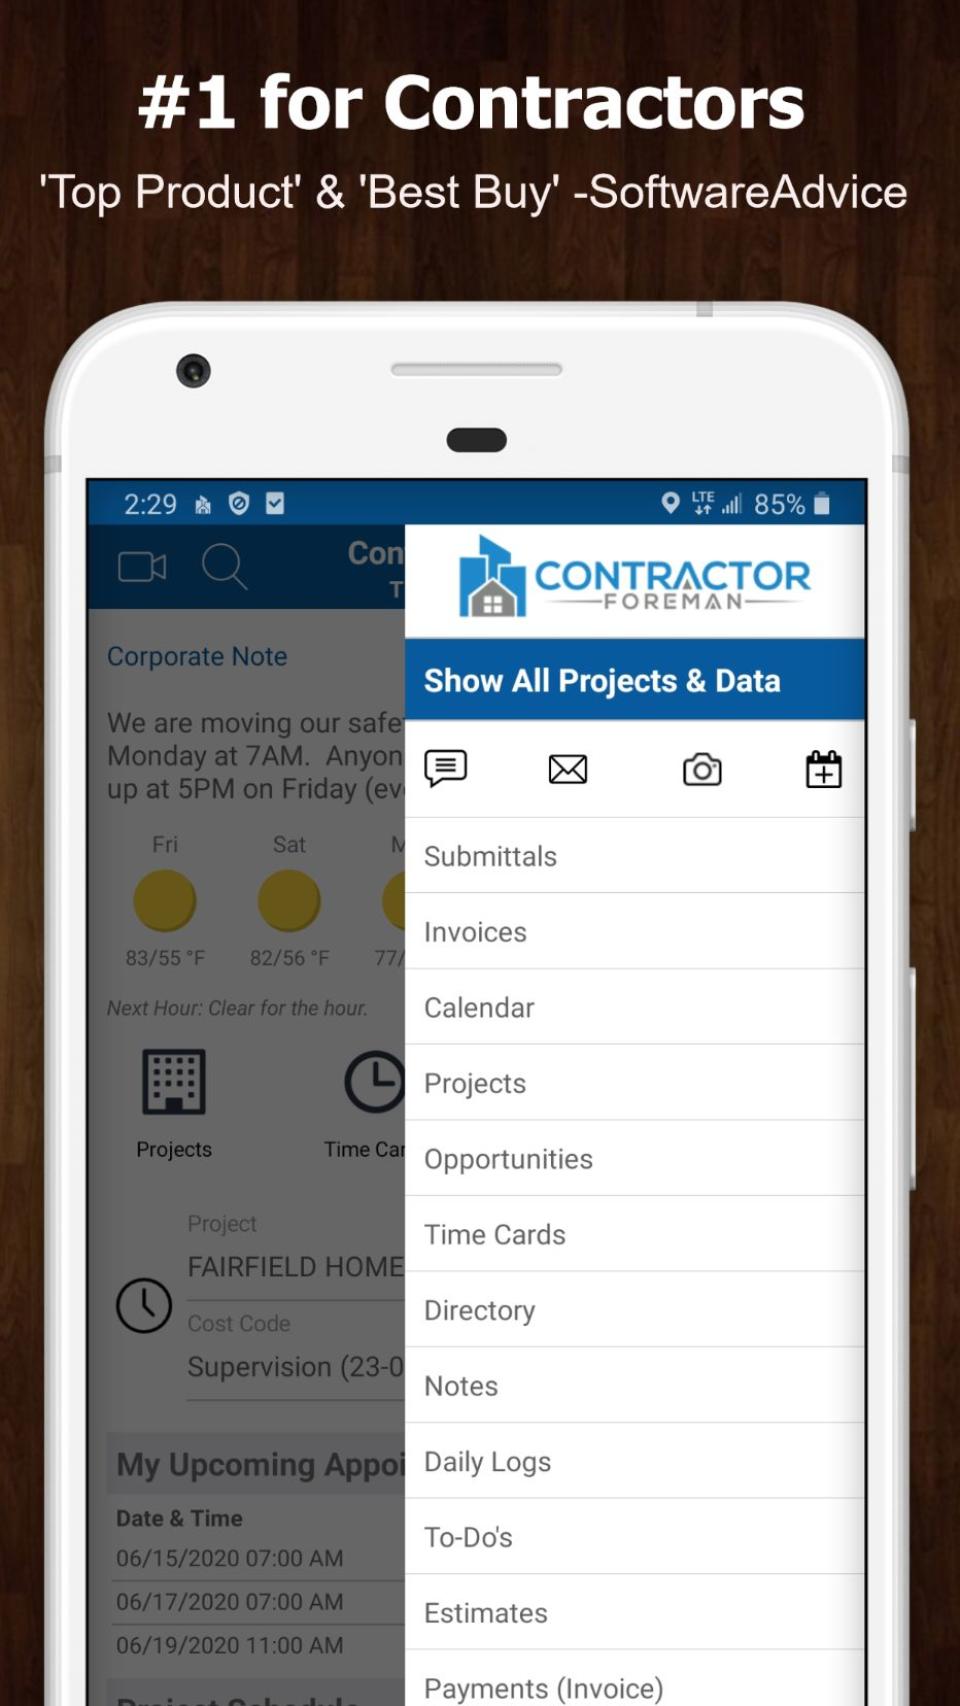 Contractor Foreman Logiciel - 1